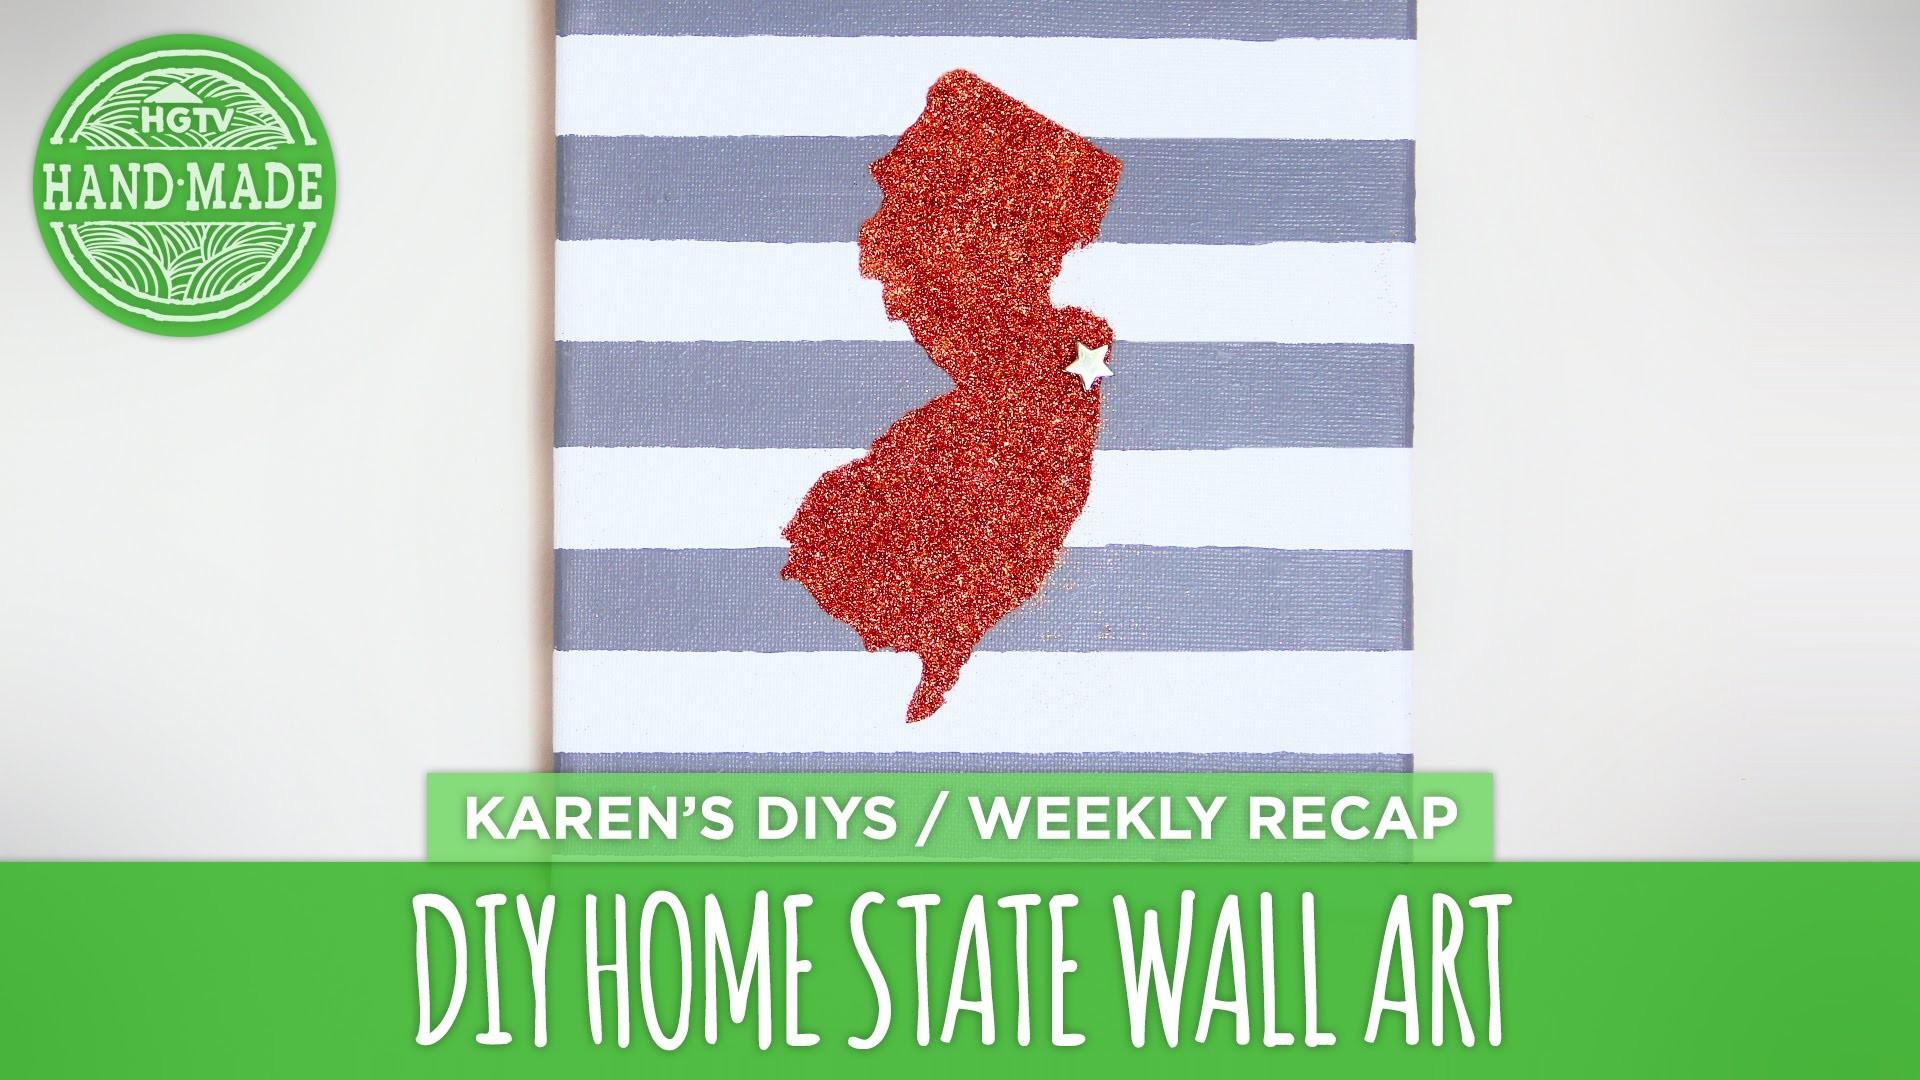 DIY Home State Wall Art - HGTV Handmade